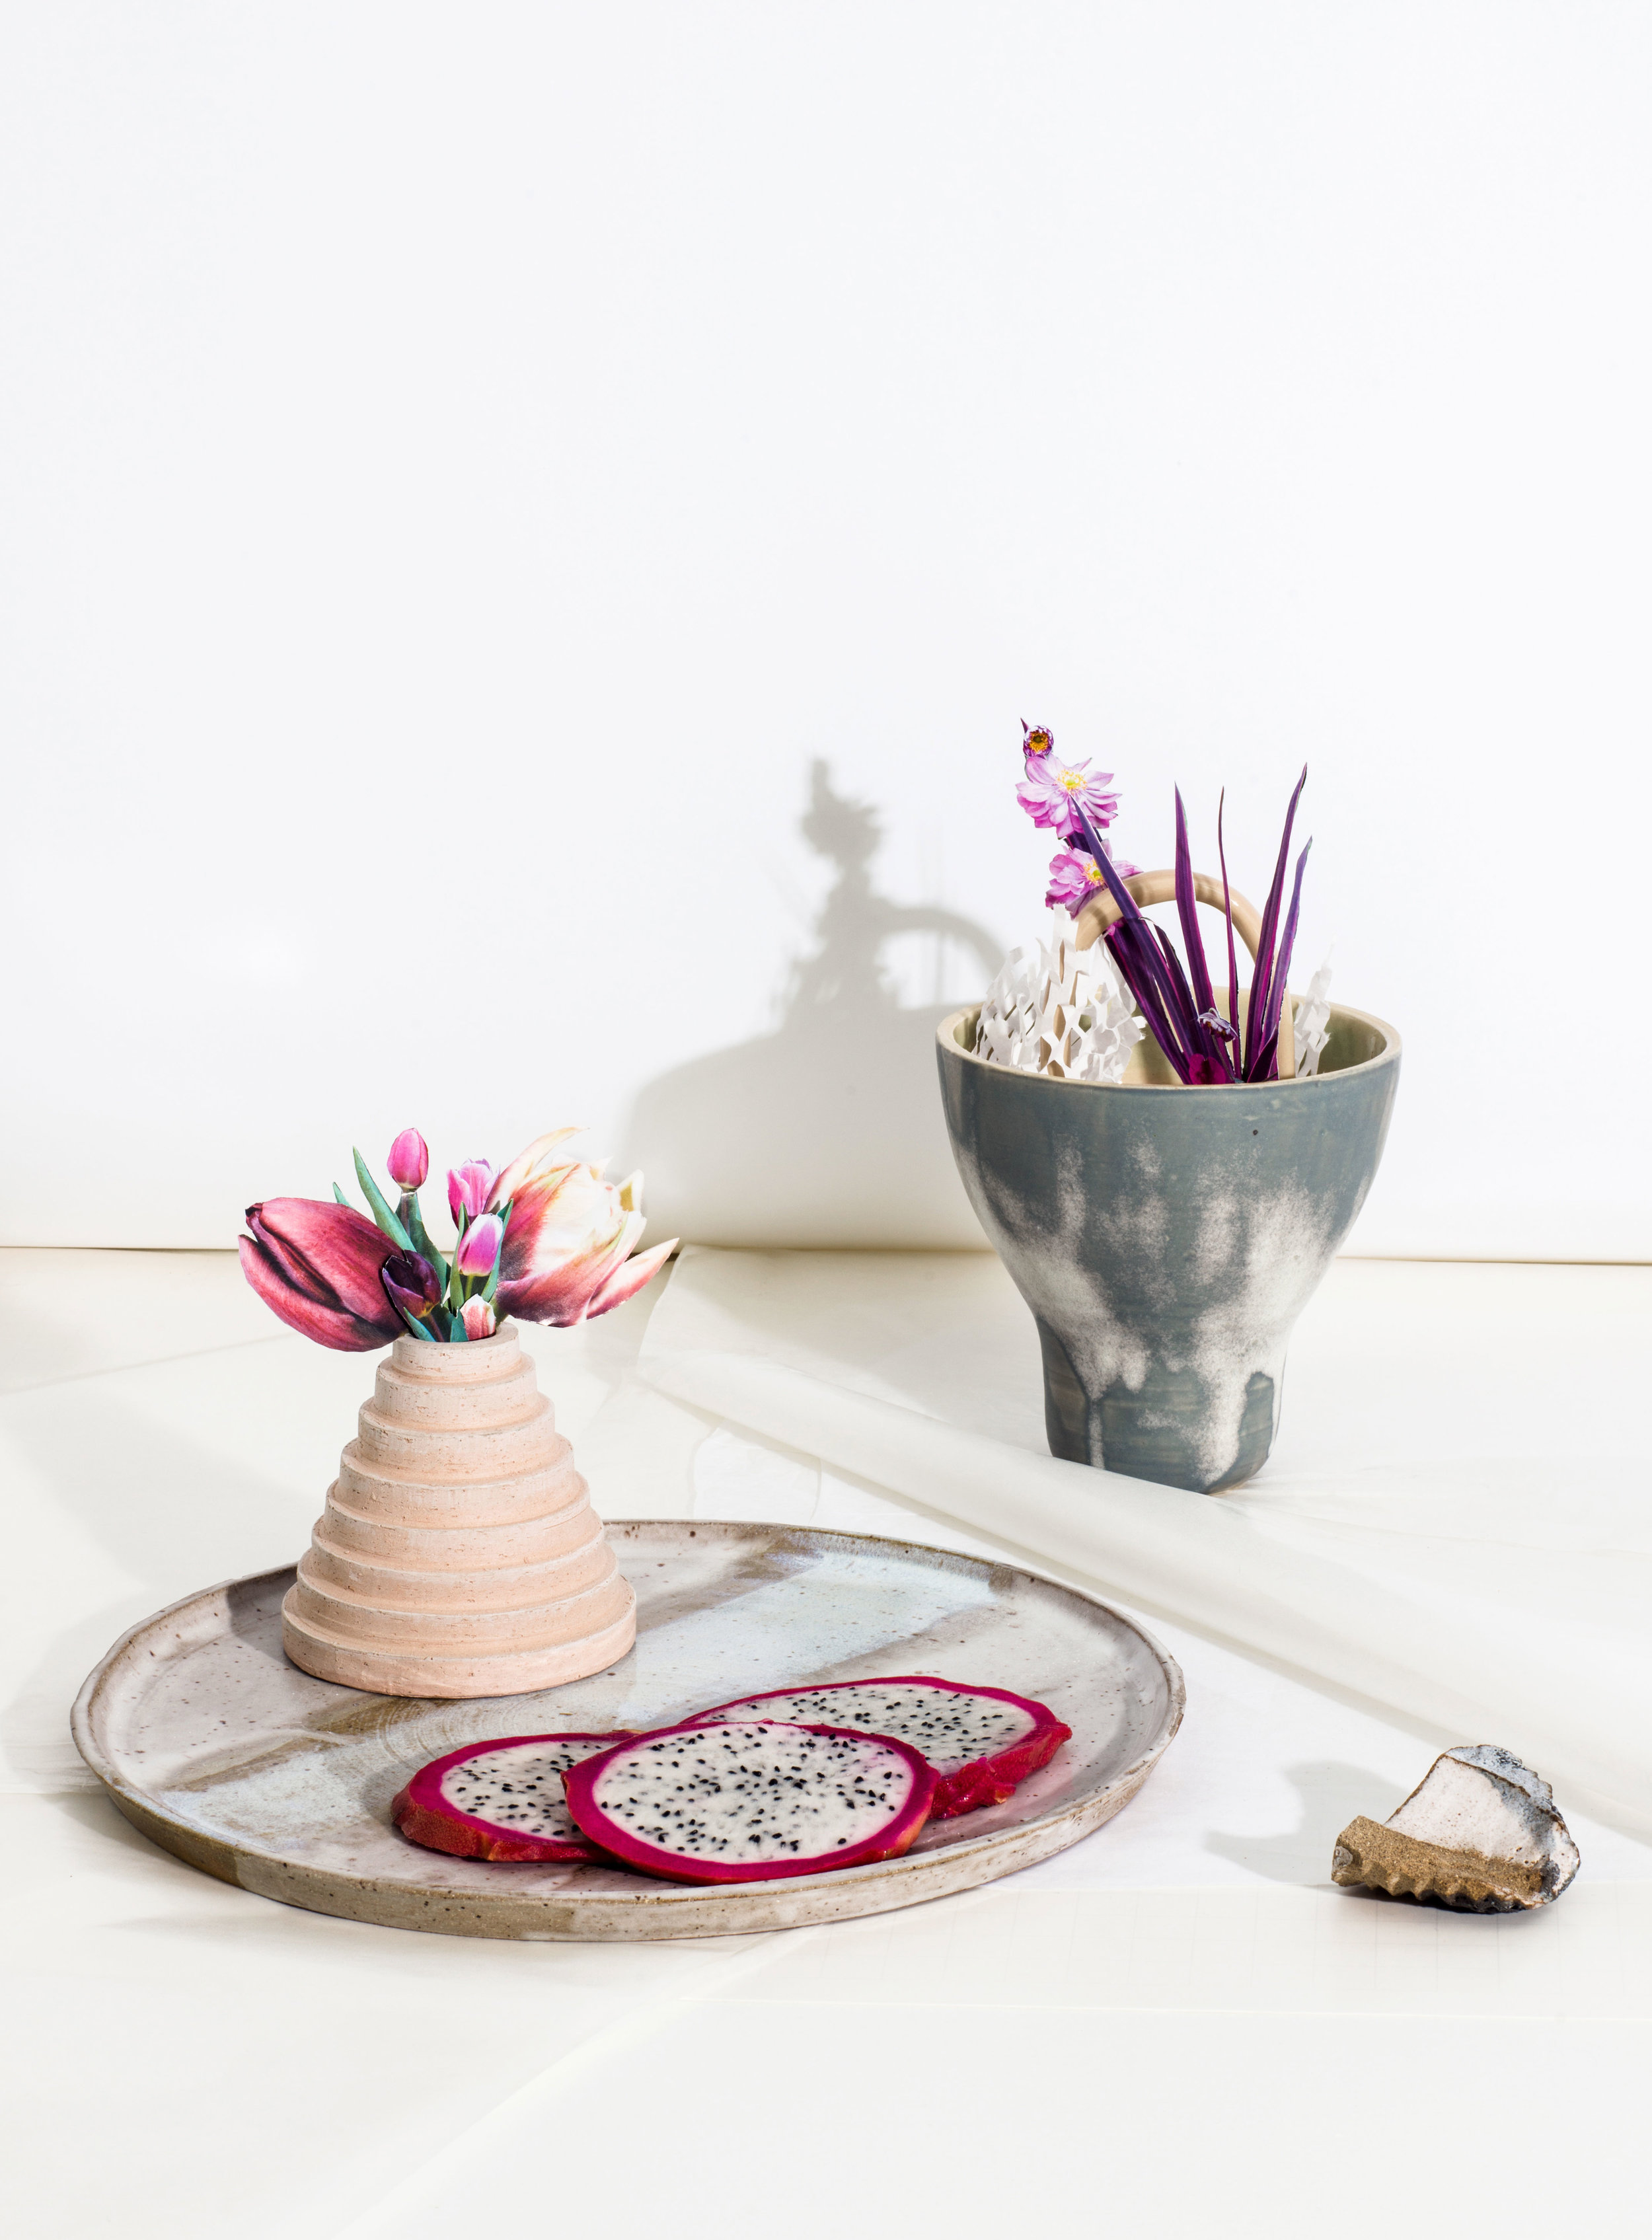 CeramicsShaoChen-1-7.jpg